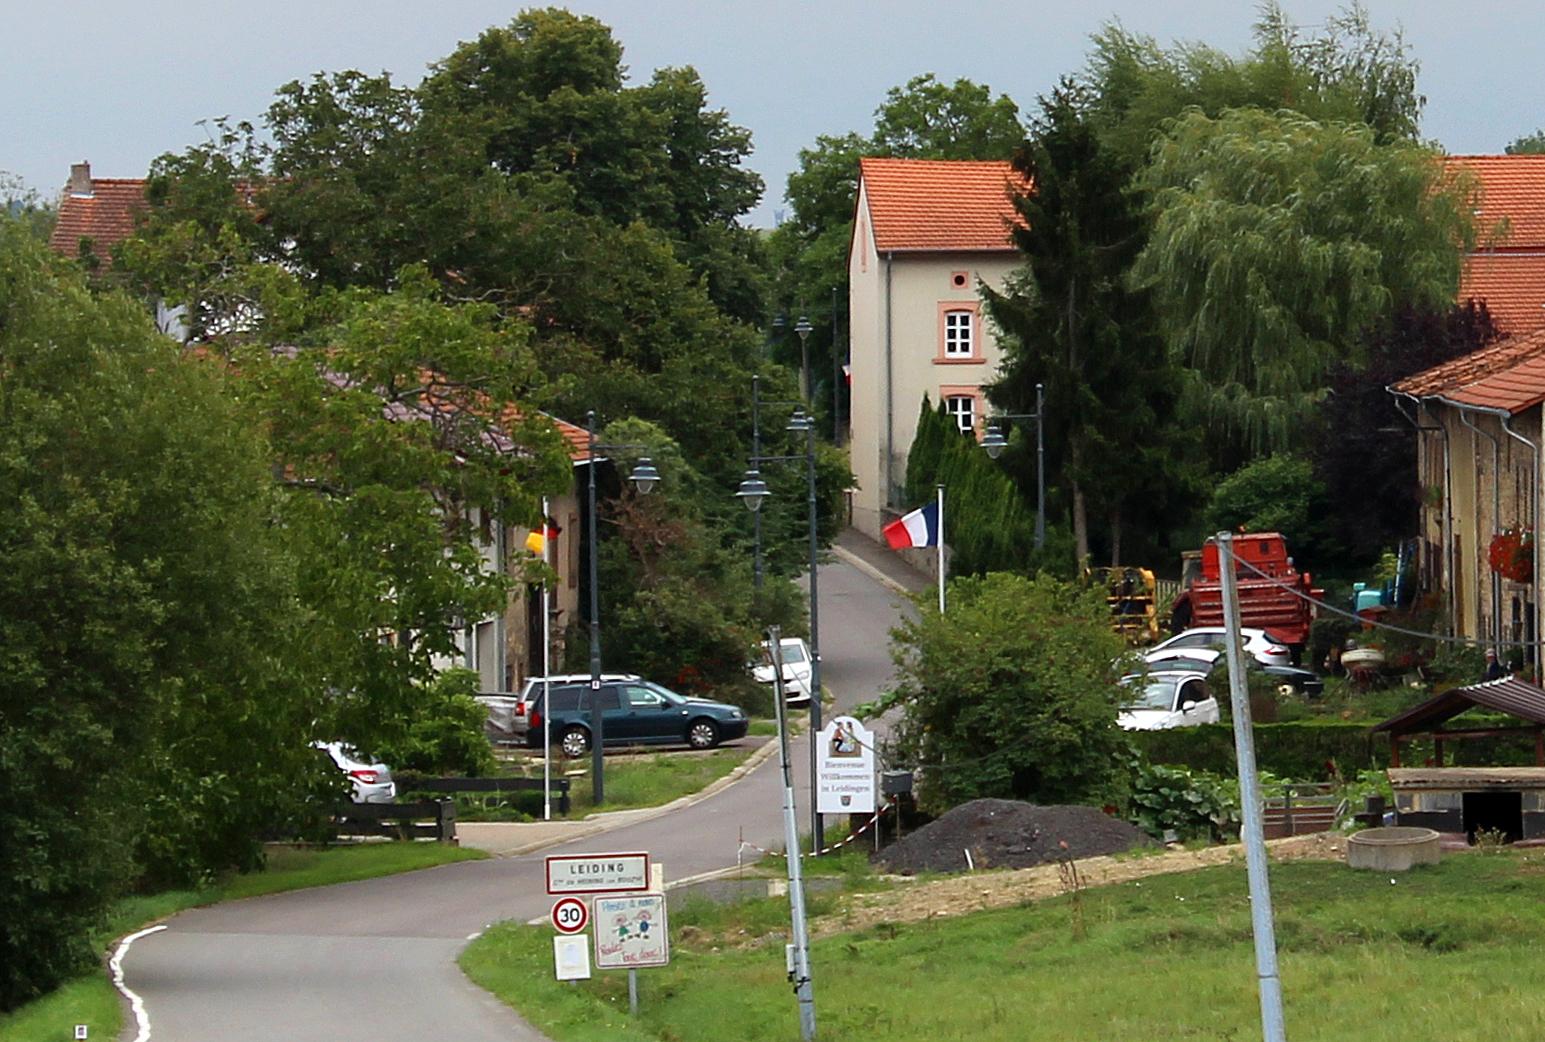 File:Leidingen Neutrale Straße 02.JPG - Wikimedia Commons